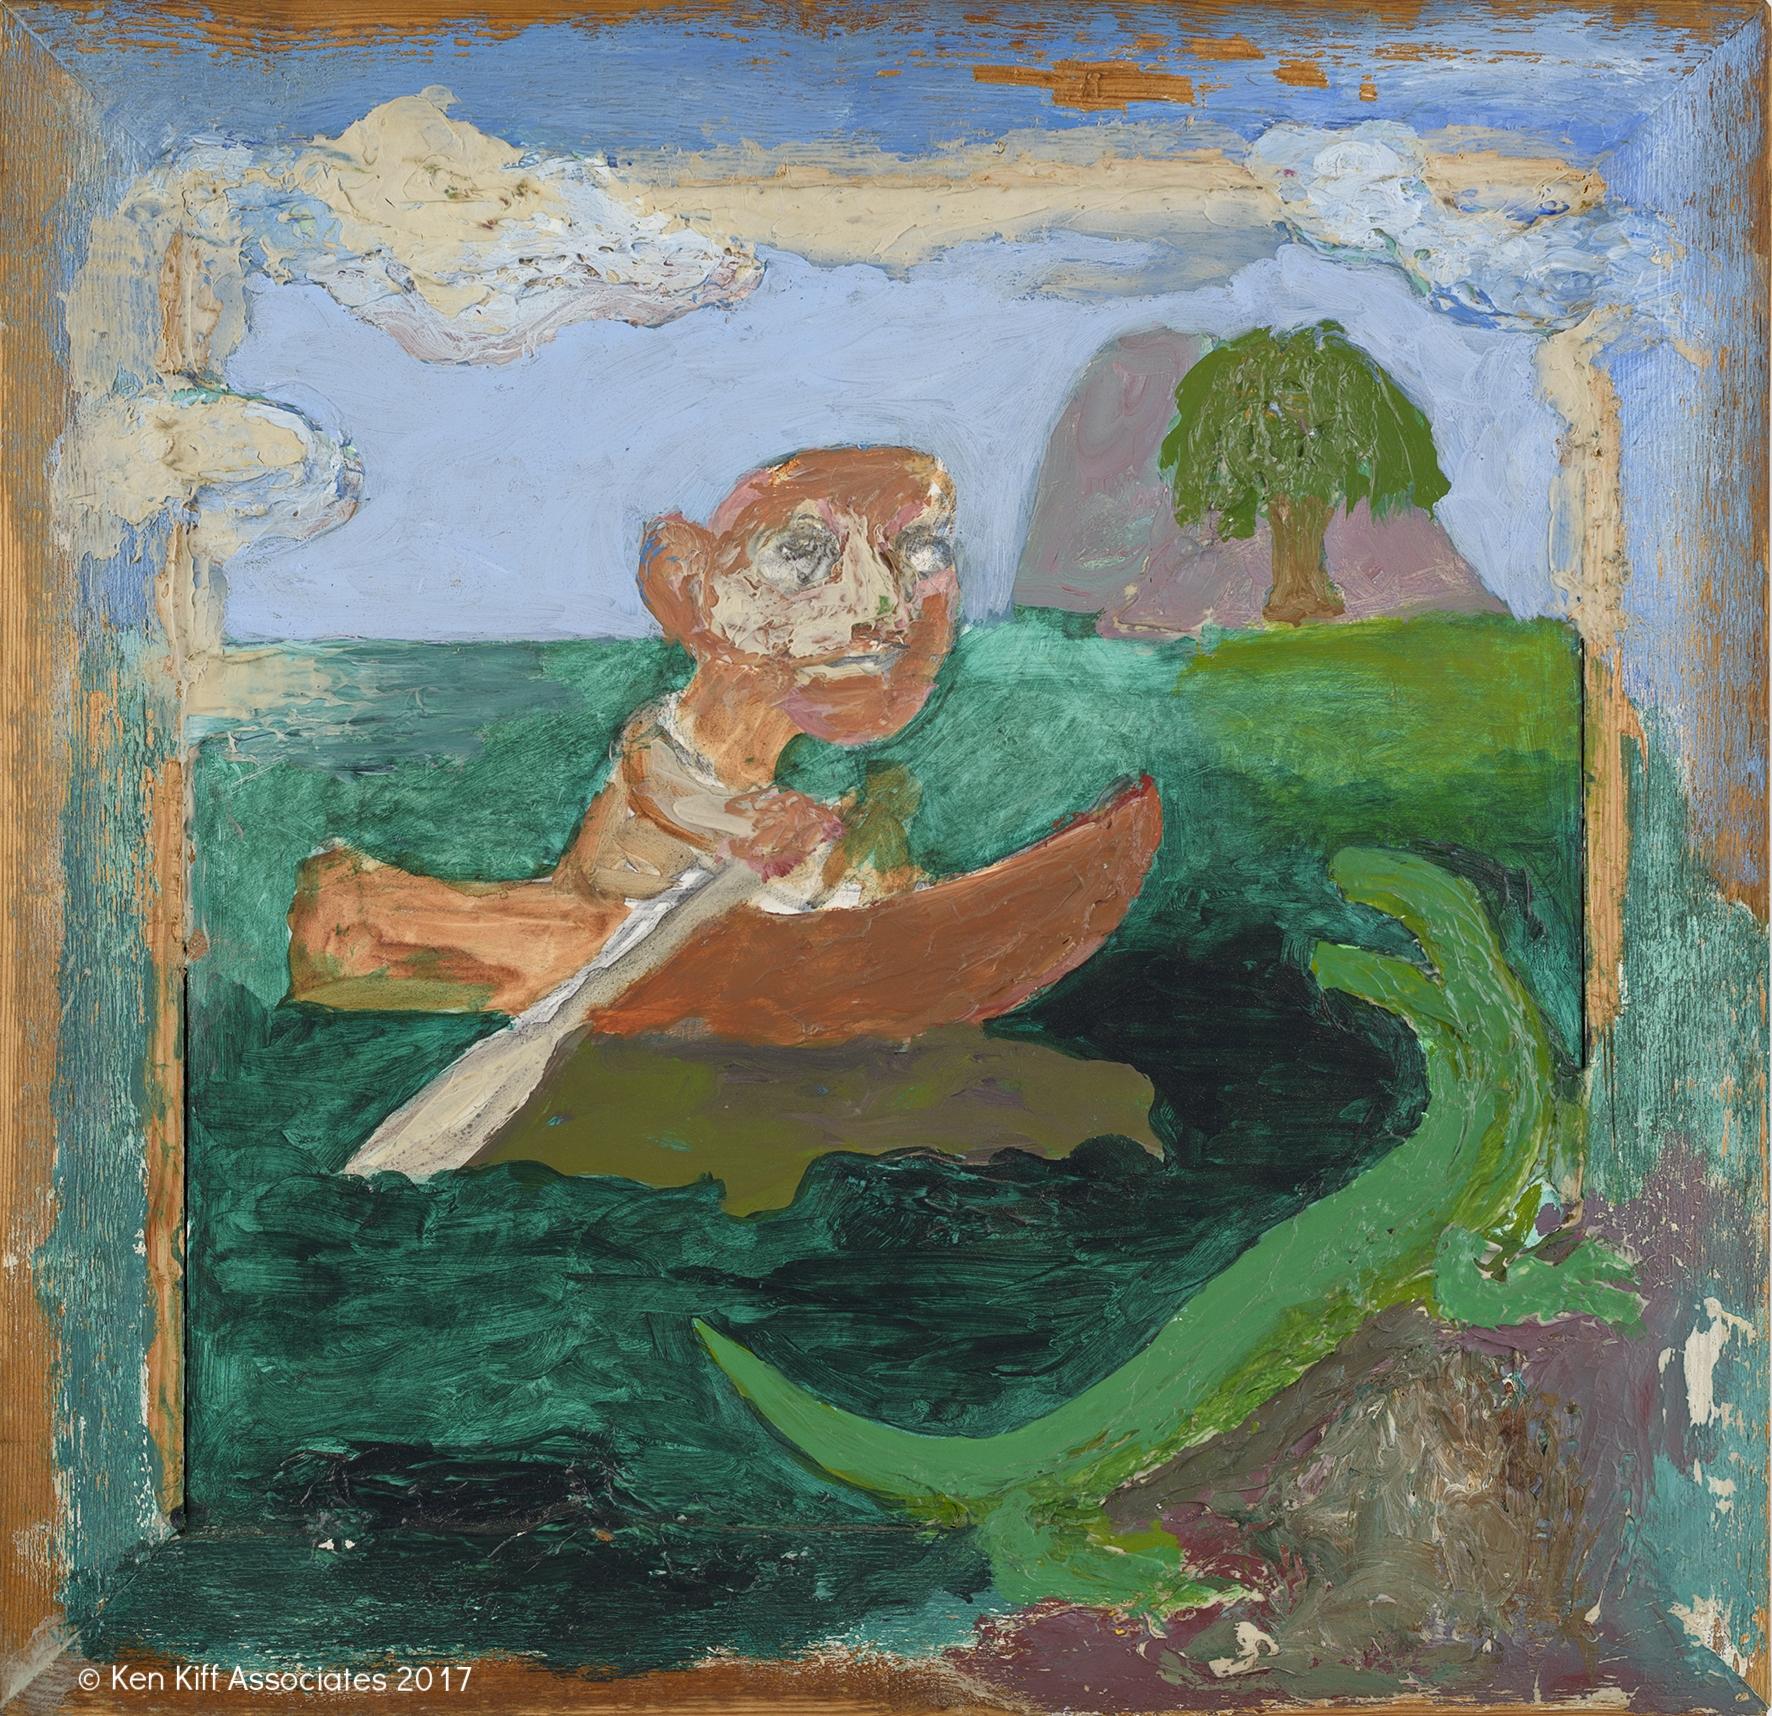 Ken Kiff - Man, Boat and Lizard